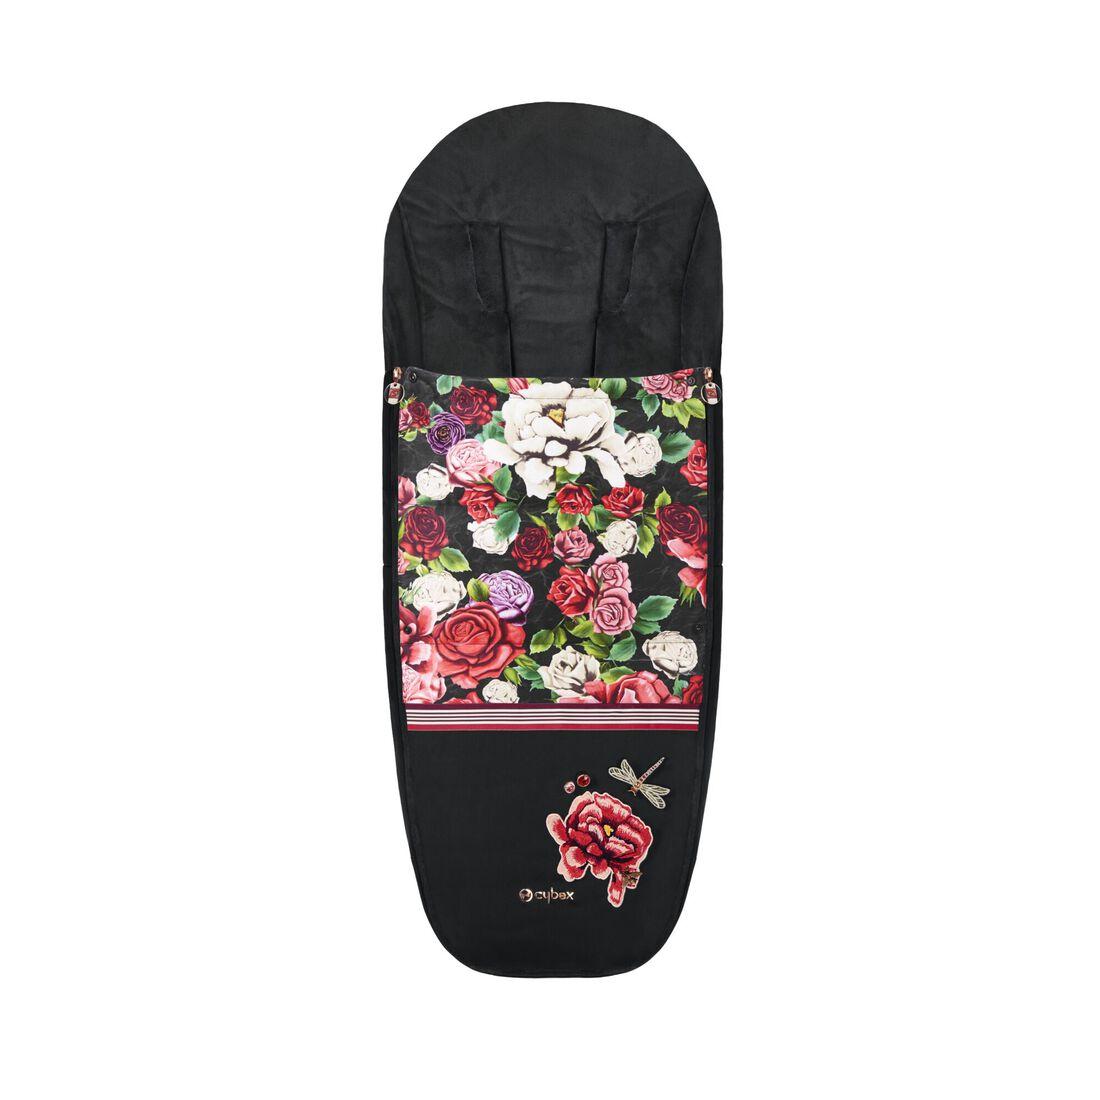 CYBEX Platinum Footmuff - Spring Blossom Dark in Spring Blossom Dark large image number 1